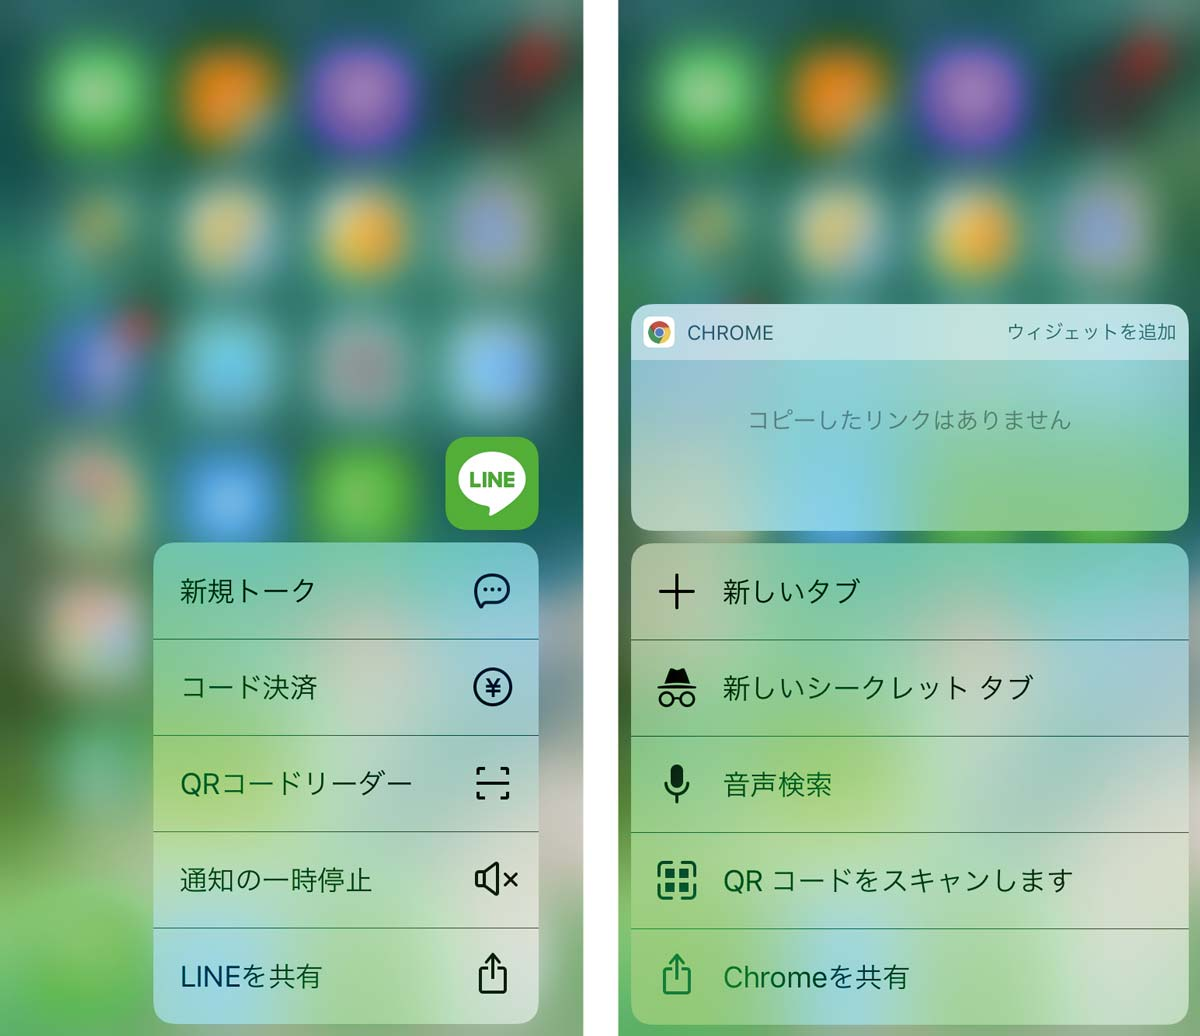 LINEとChrome QRコード